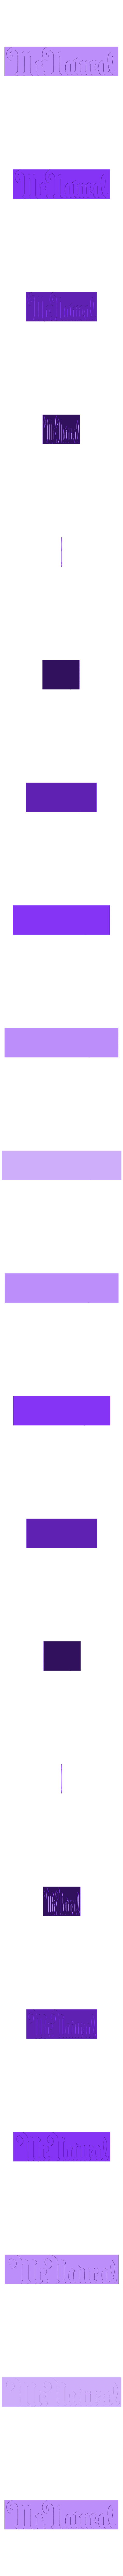 Mr_Natural.stl Download free STL file Mr. Natural -  R Crumb • 3D printer object, JayOmega